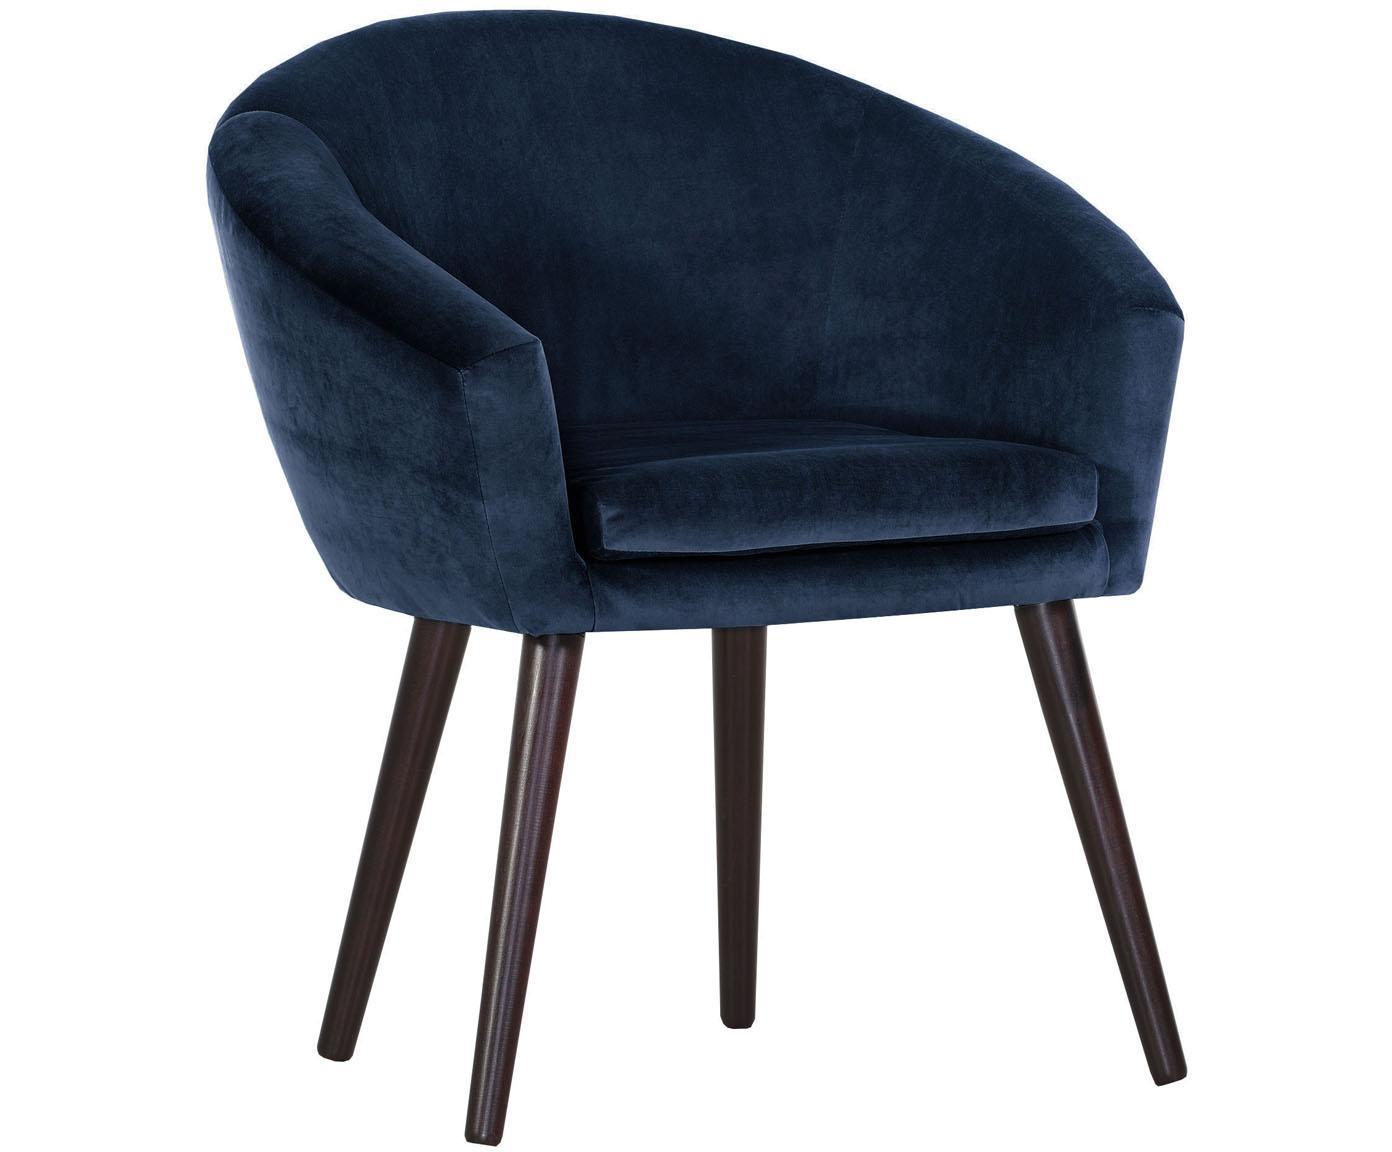 Samt-Armlehnstuhl Lino in Blau, Bezug: Polyester (Samt), Füße: Holz, lackiert, Samt Dunkelblau, B 75 x T 66 cm